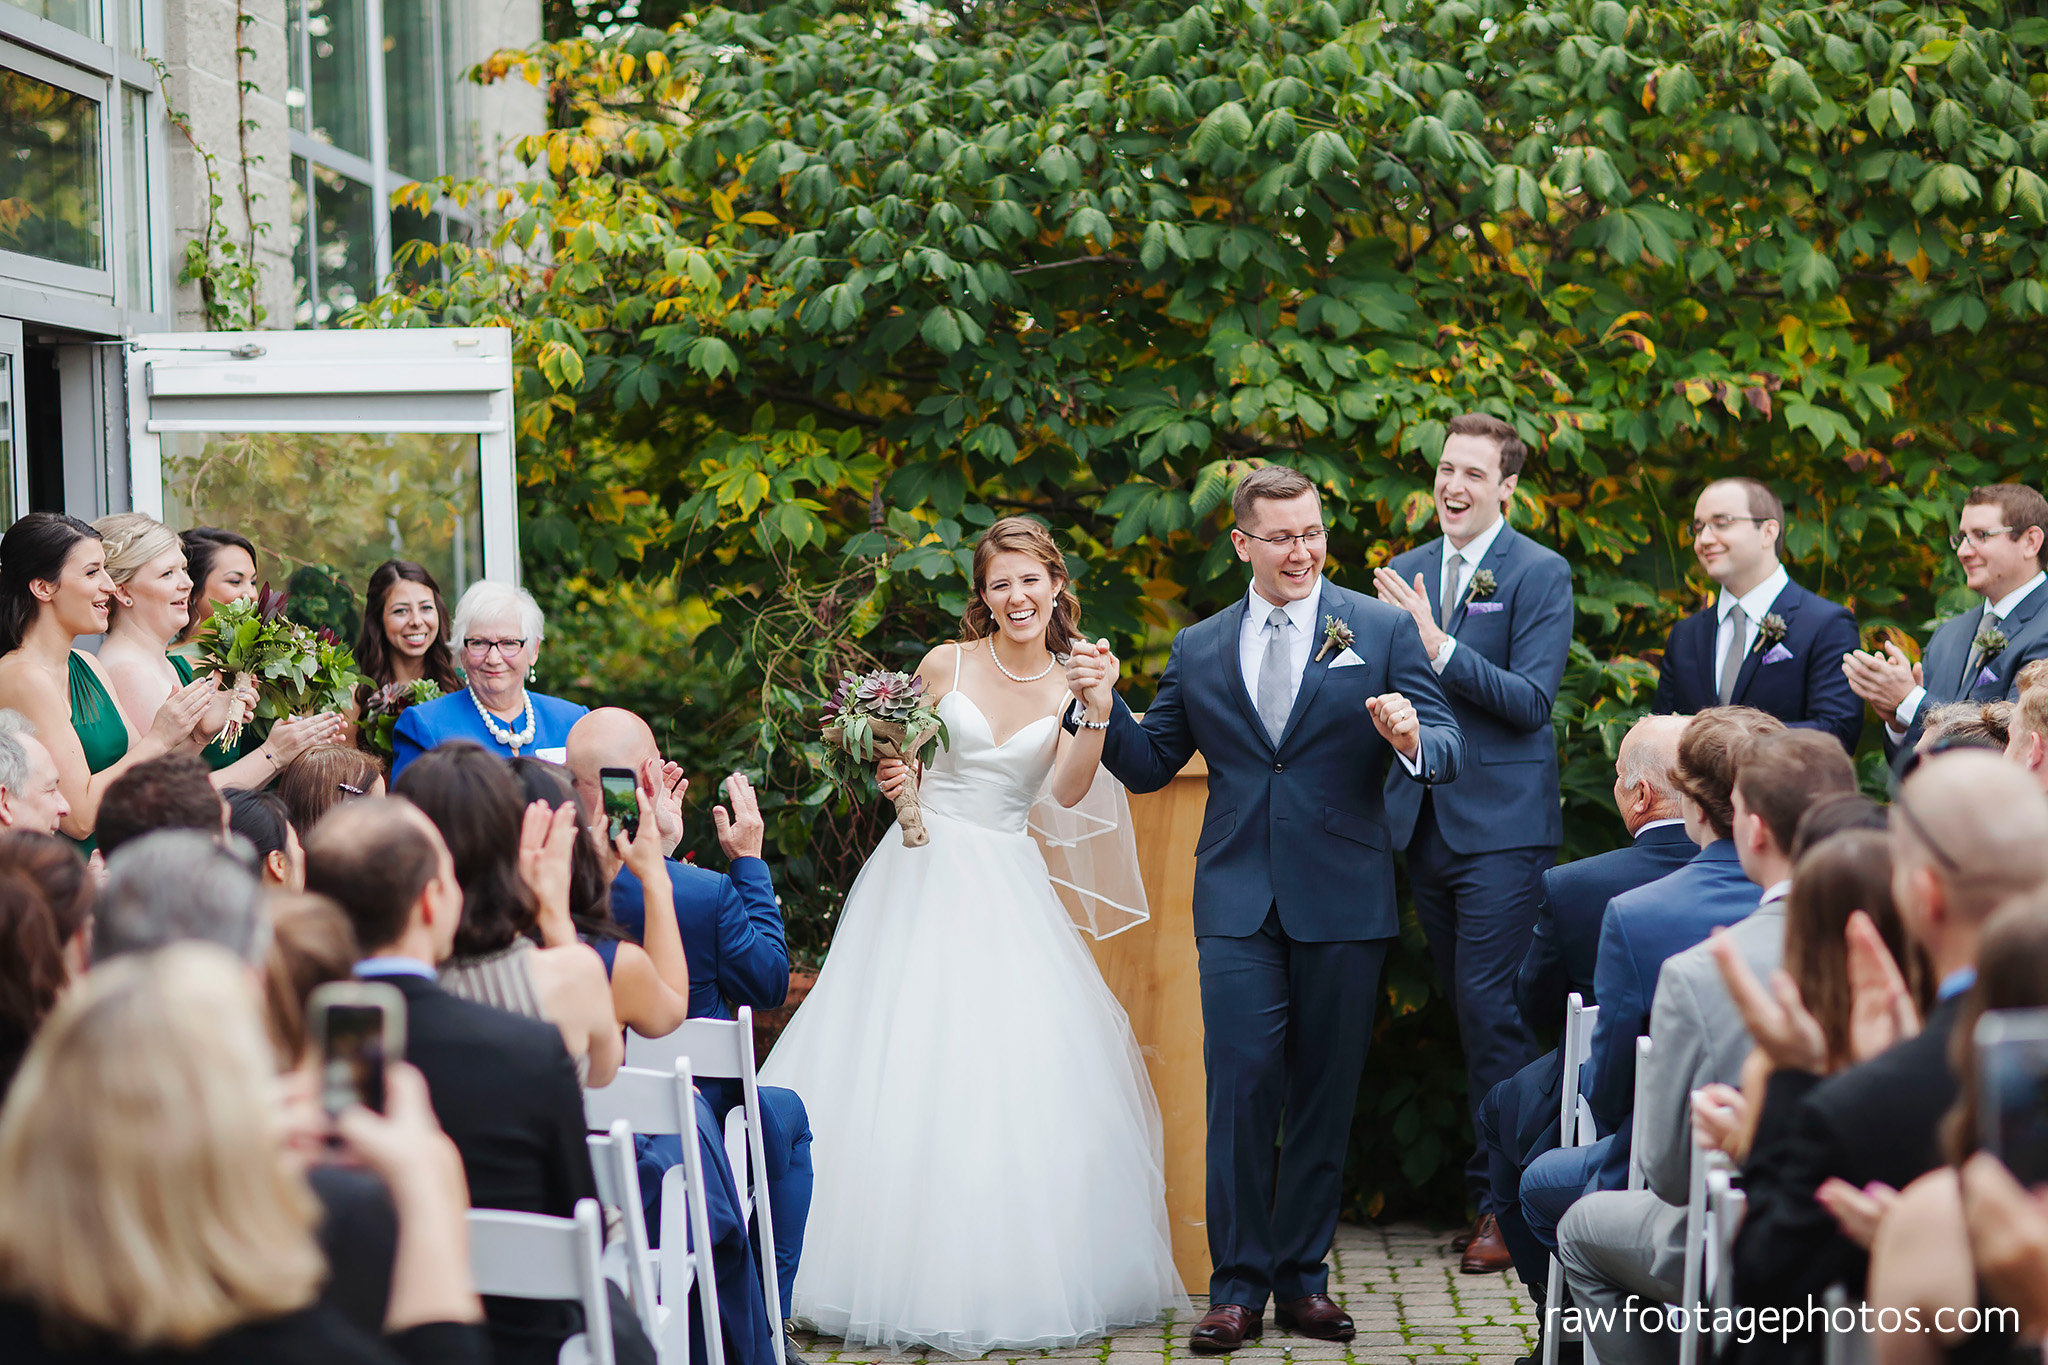 london_ontario_wedding_photographer-civic_gardens-springbank_park-succulent_bouquet-fall_wedding-bridge-raw_footage_photography045.jpg